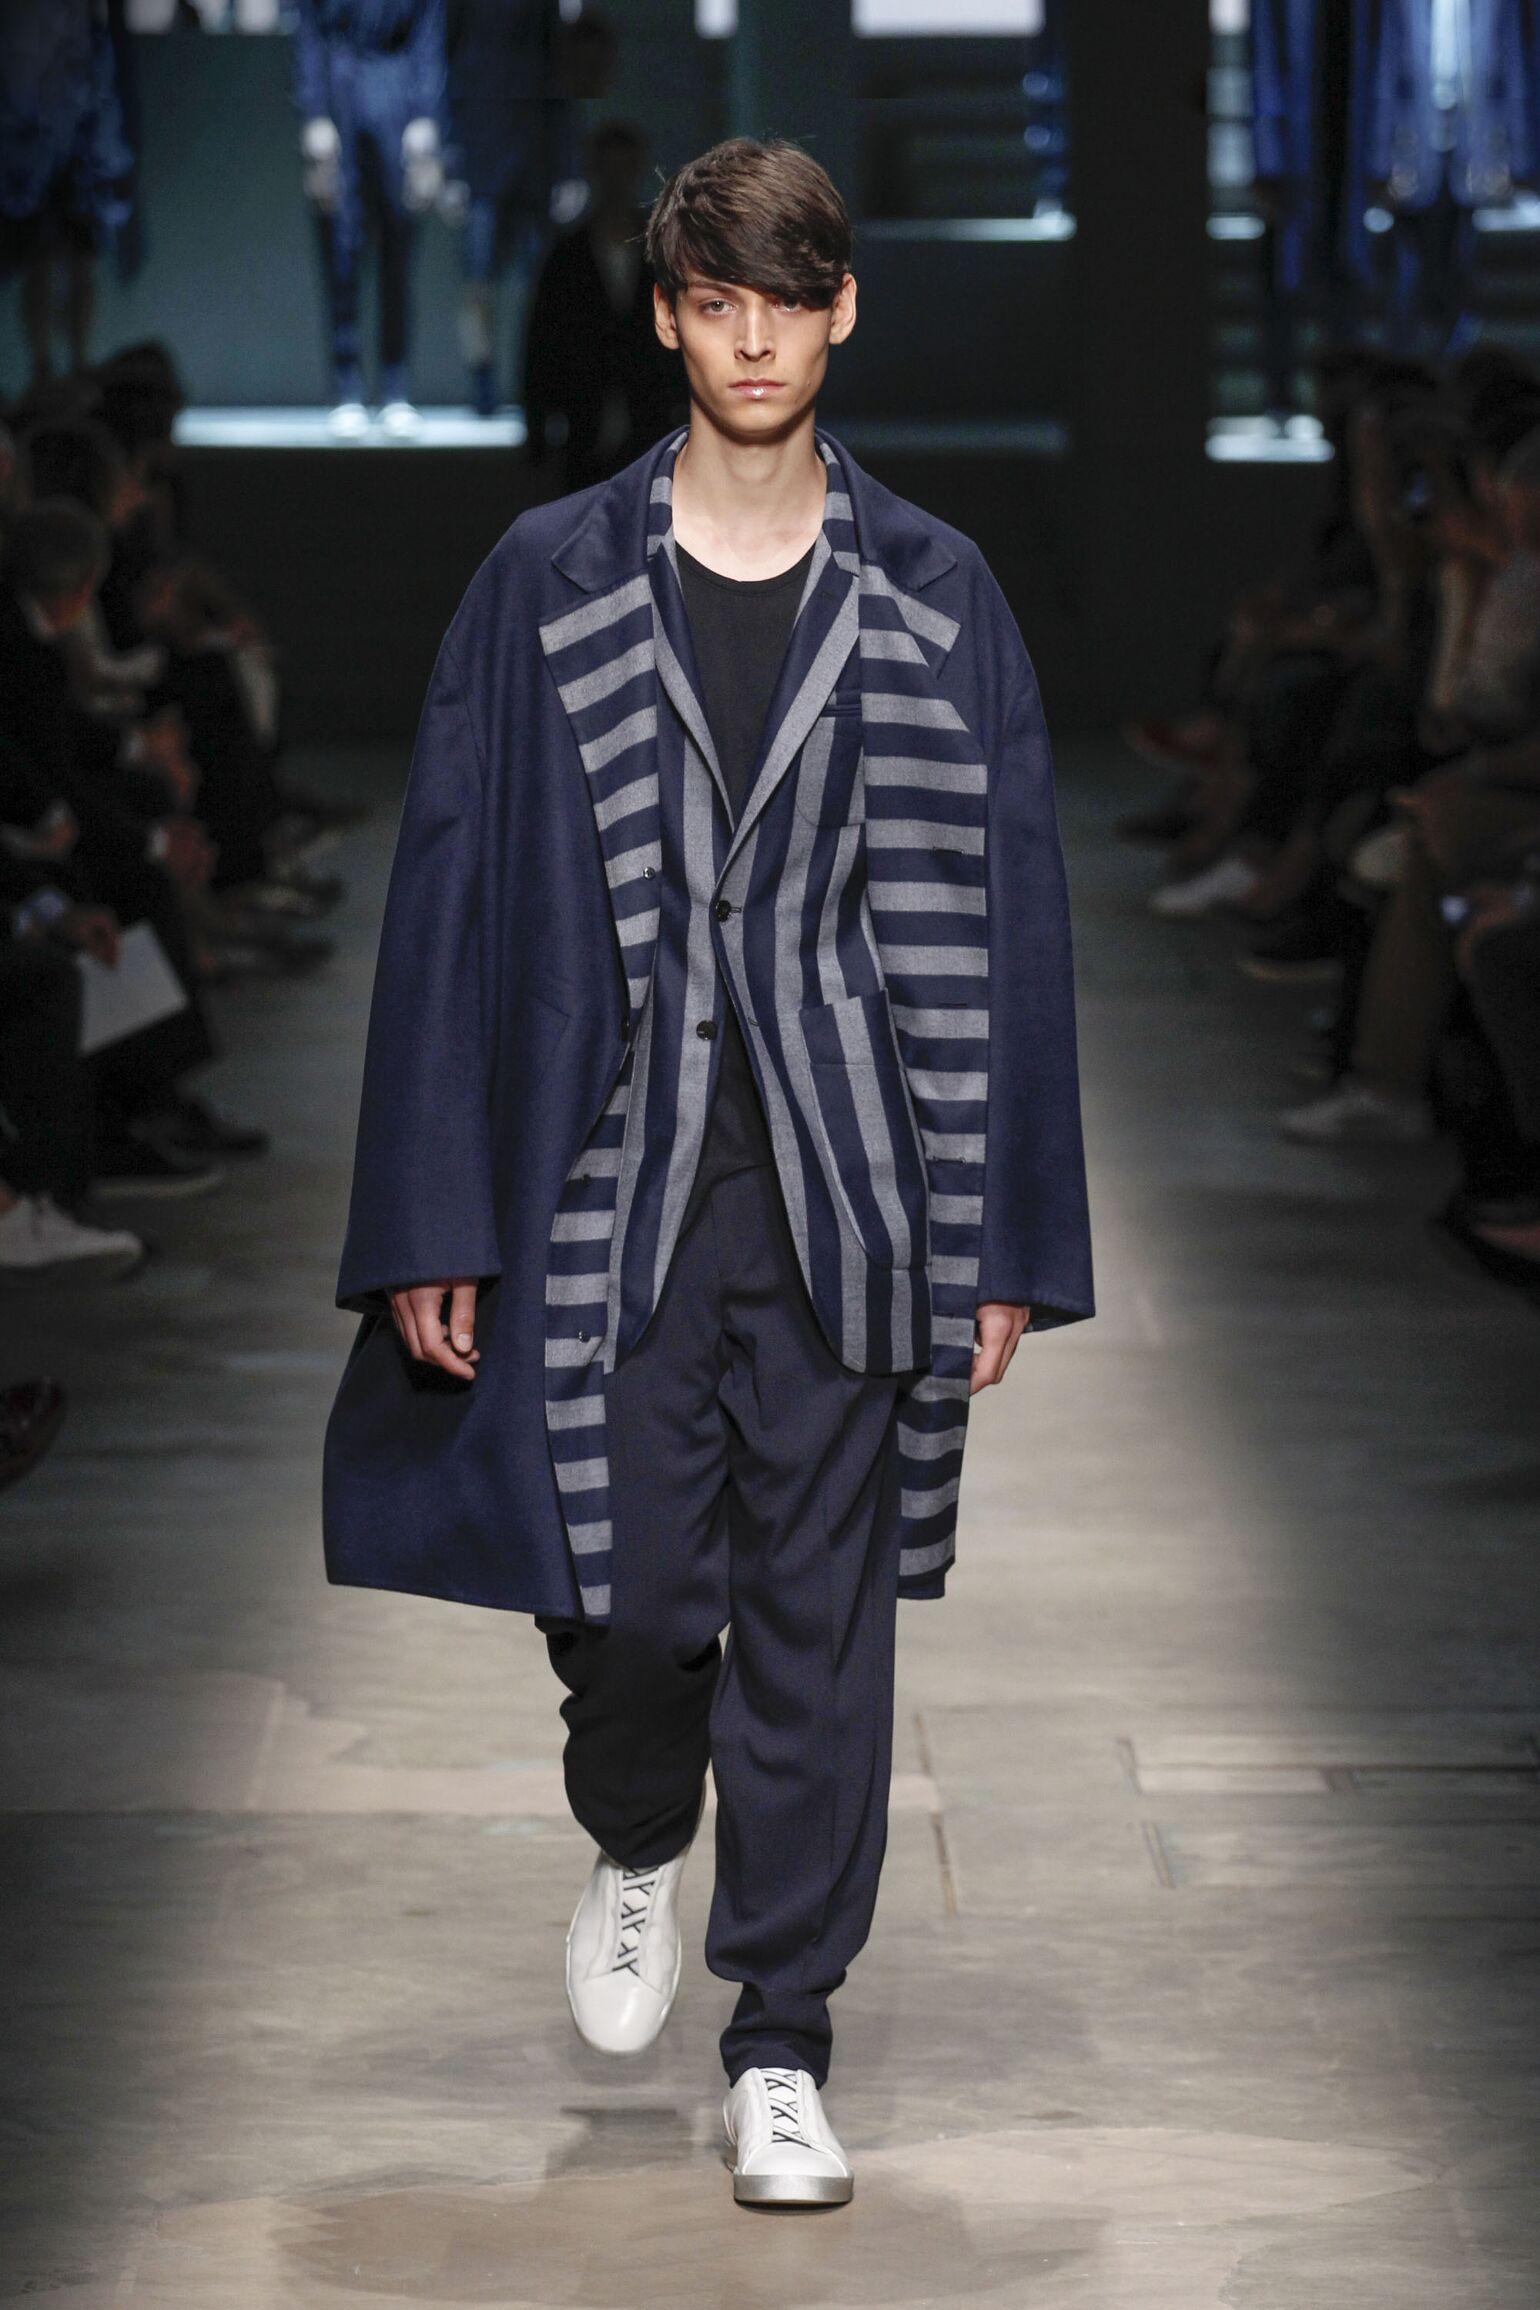 Spring Summer 2015 Fashion Model Ermenegildo Zegna Couture